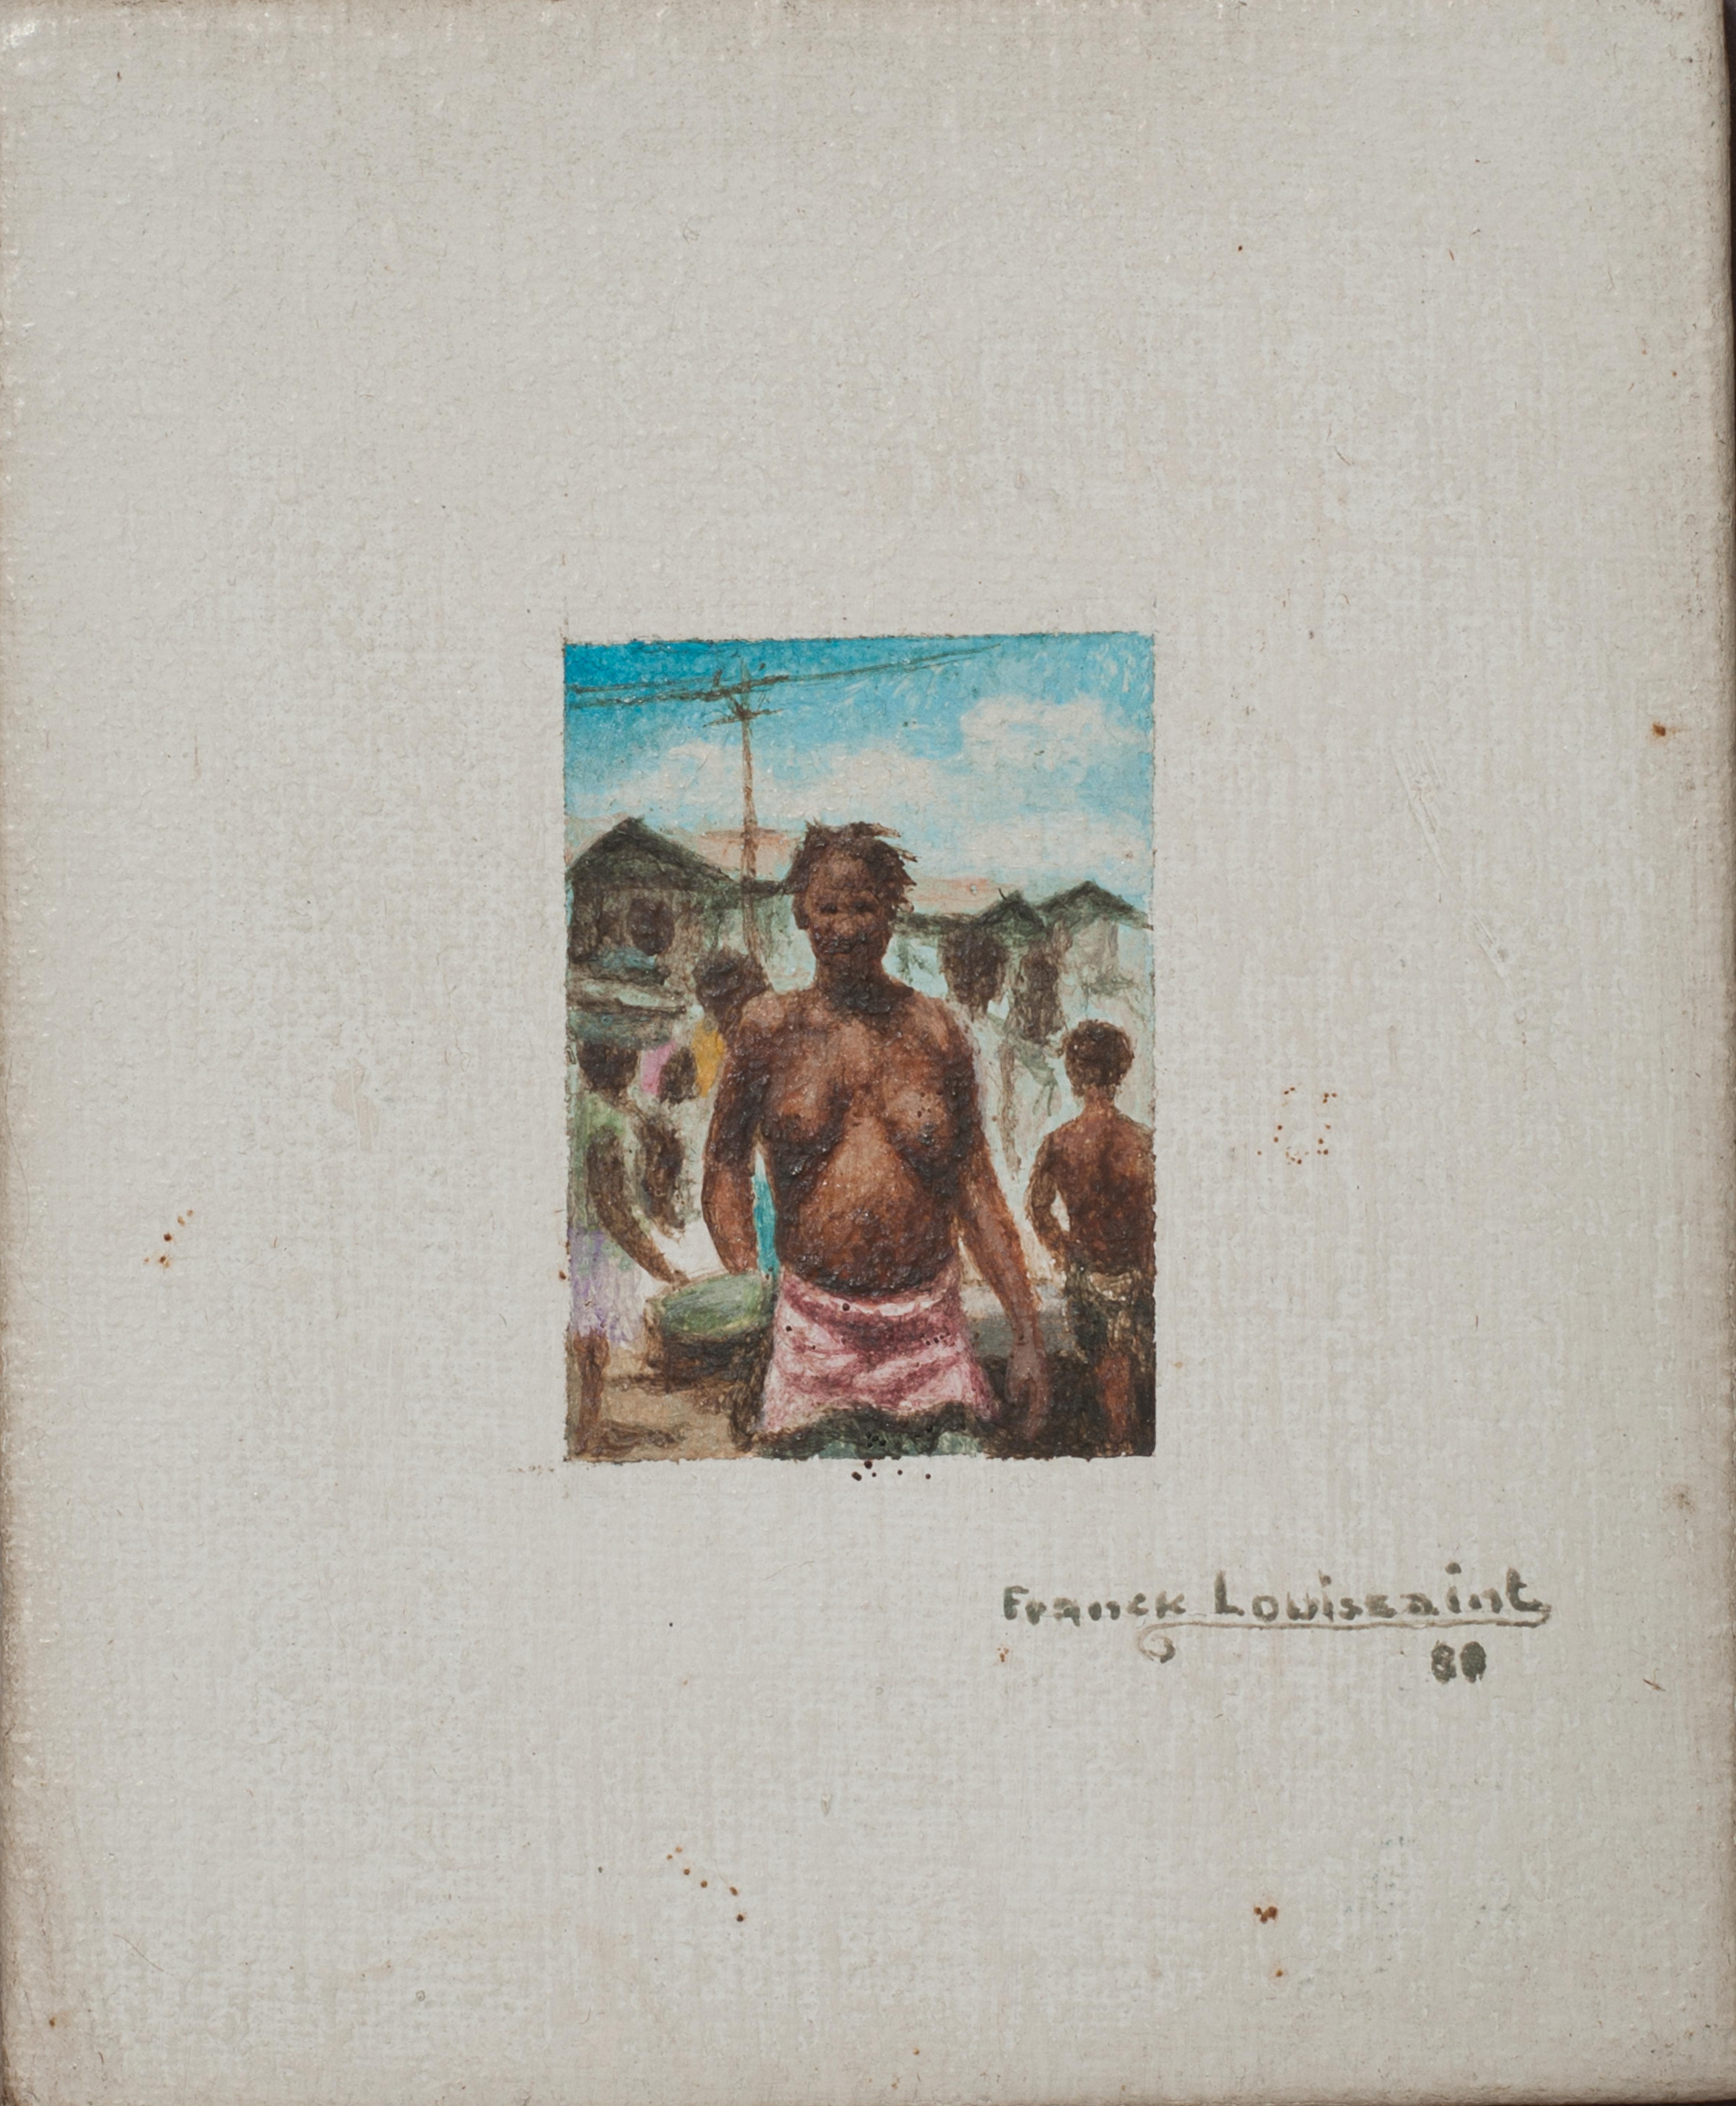 Louissaint Franck 4 1:2X4 #1 Board 1980.